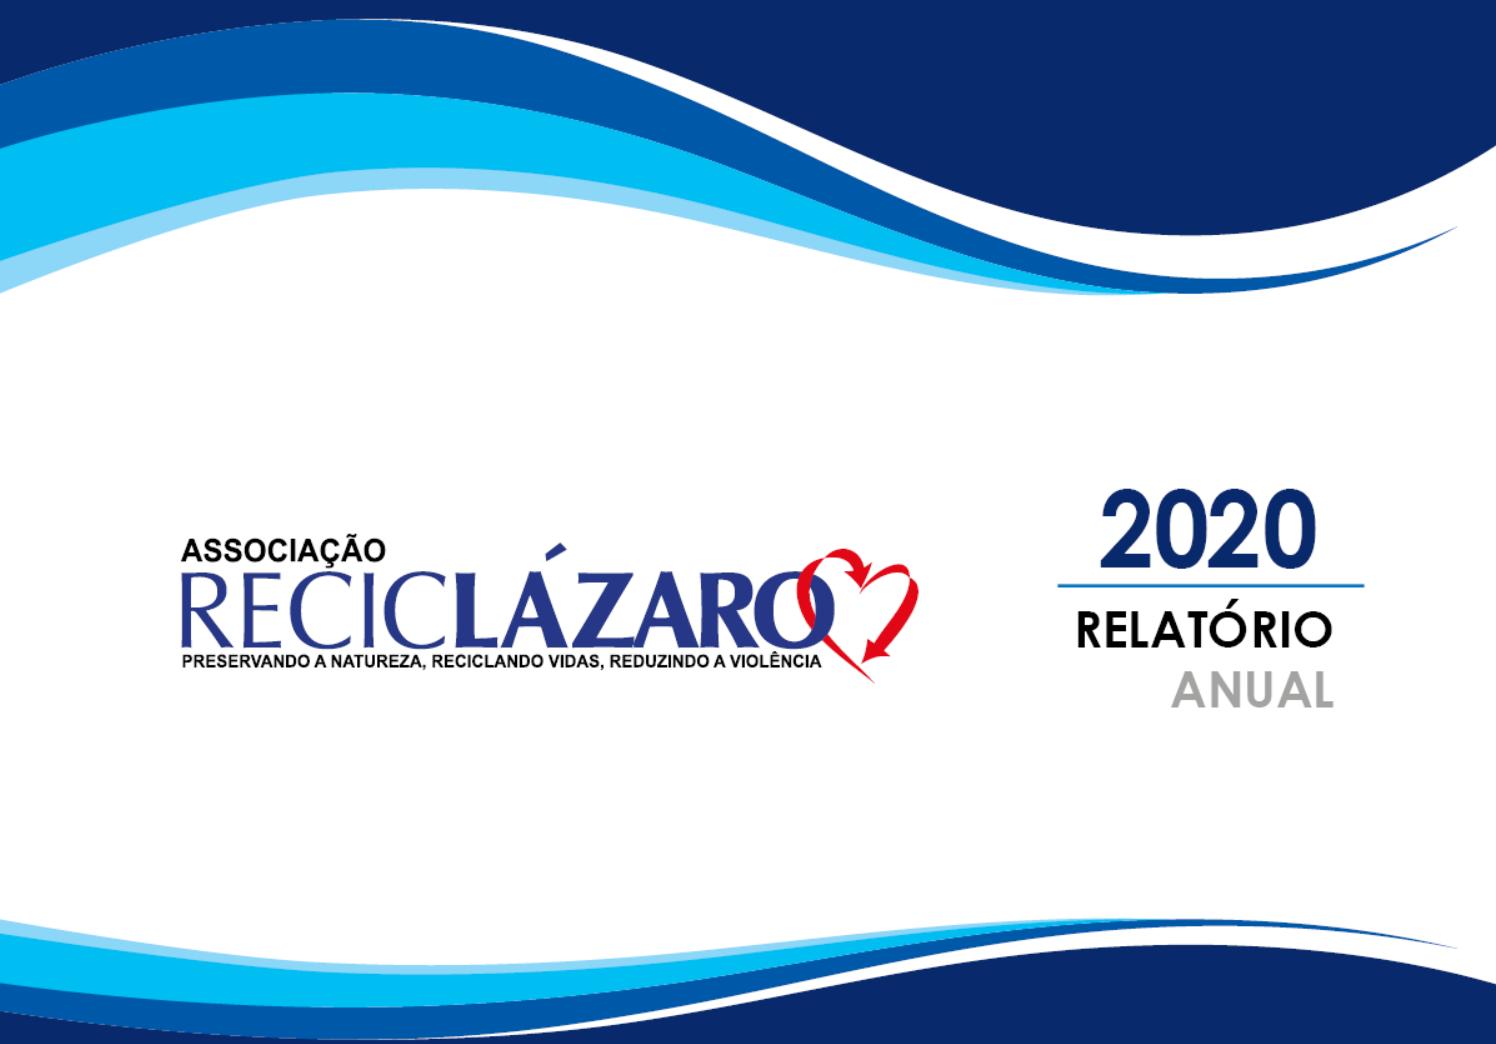 RA 2020